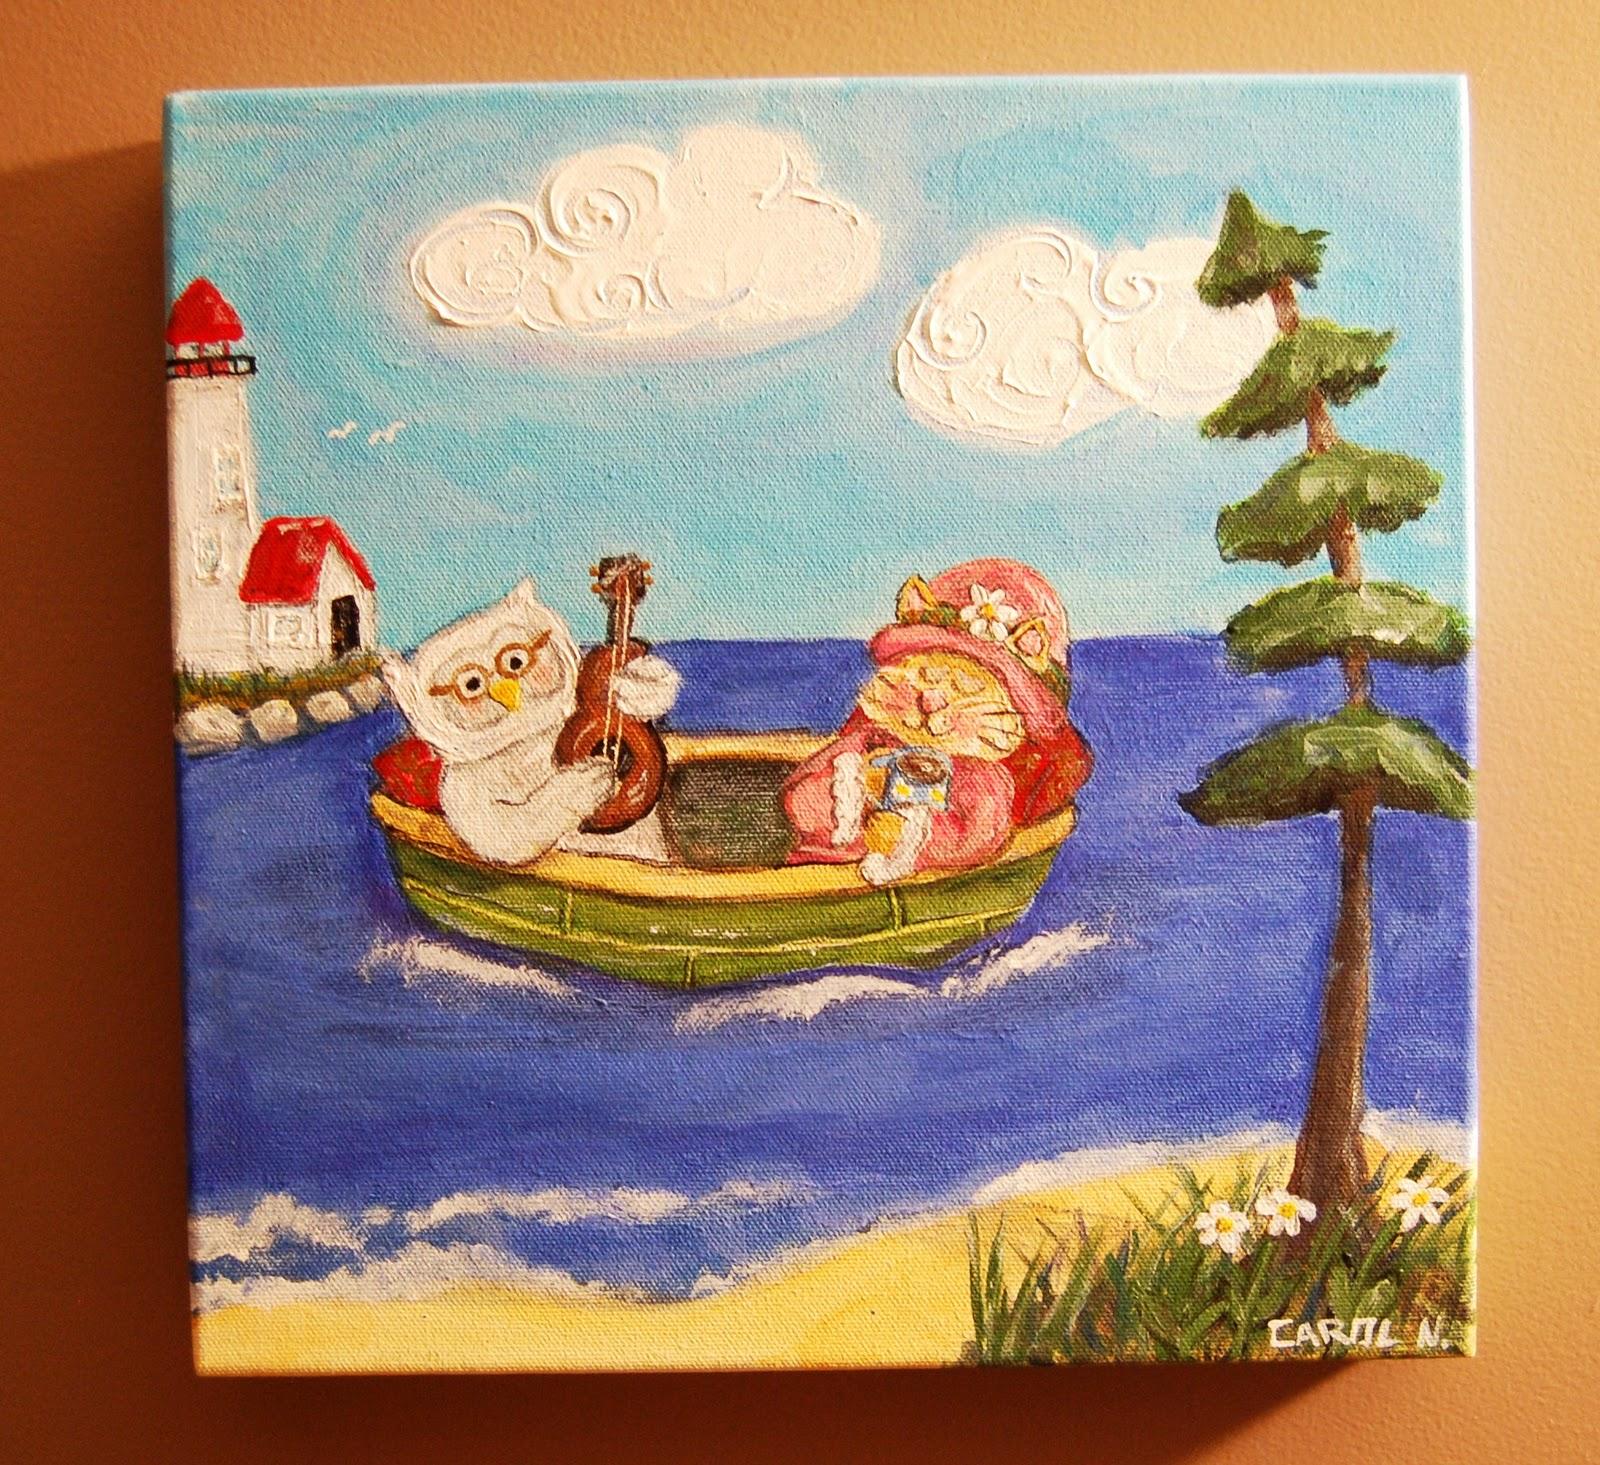 Beautiful Pea Green Boat - Get Religion